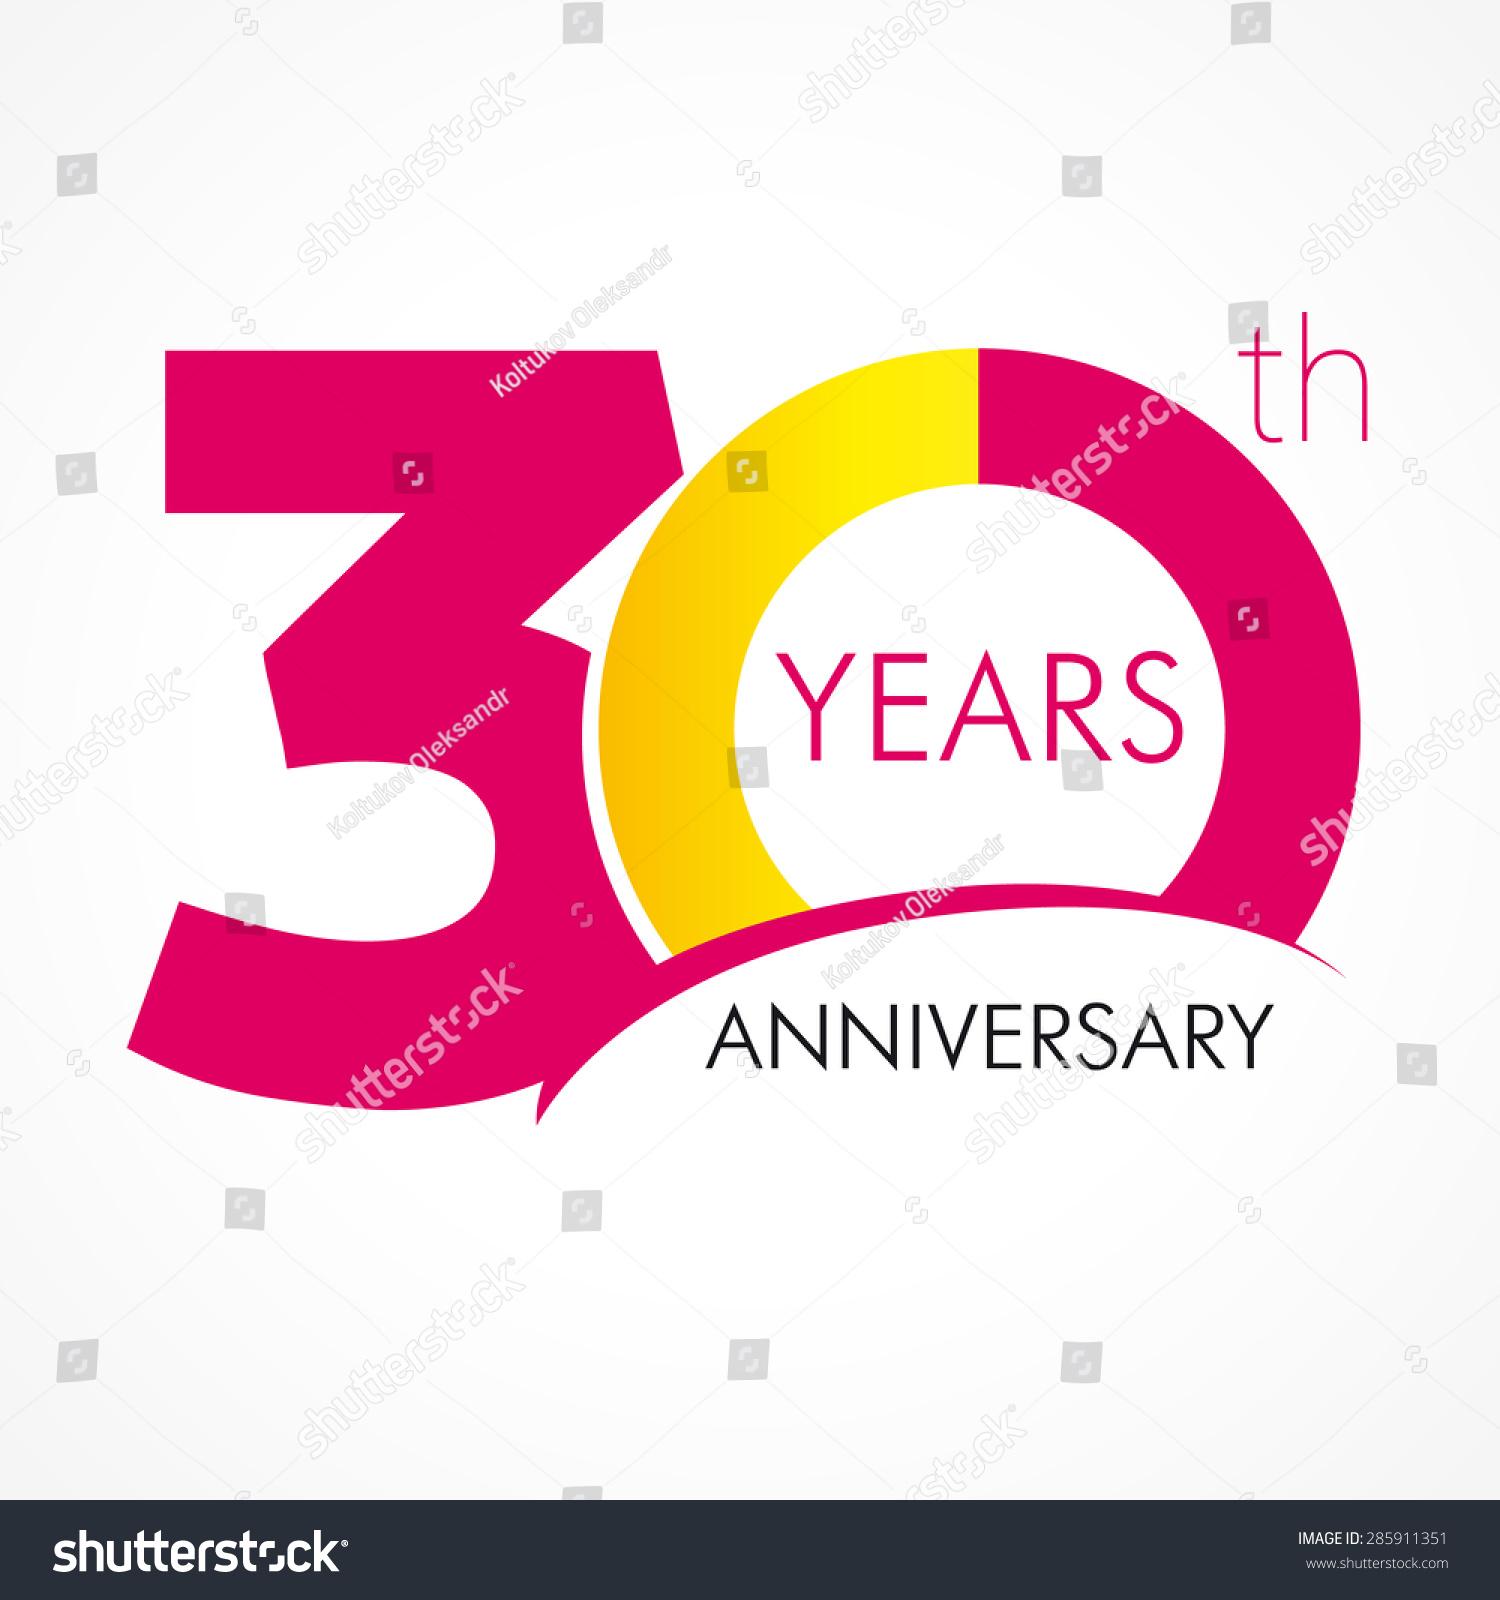 30 Year Anniversary Symbol: Template Logo 30th Anniversary Circle Form Stock Vector